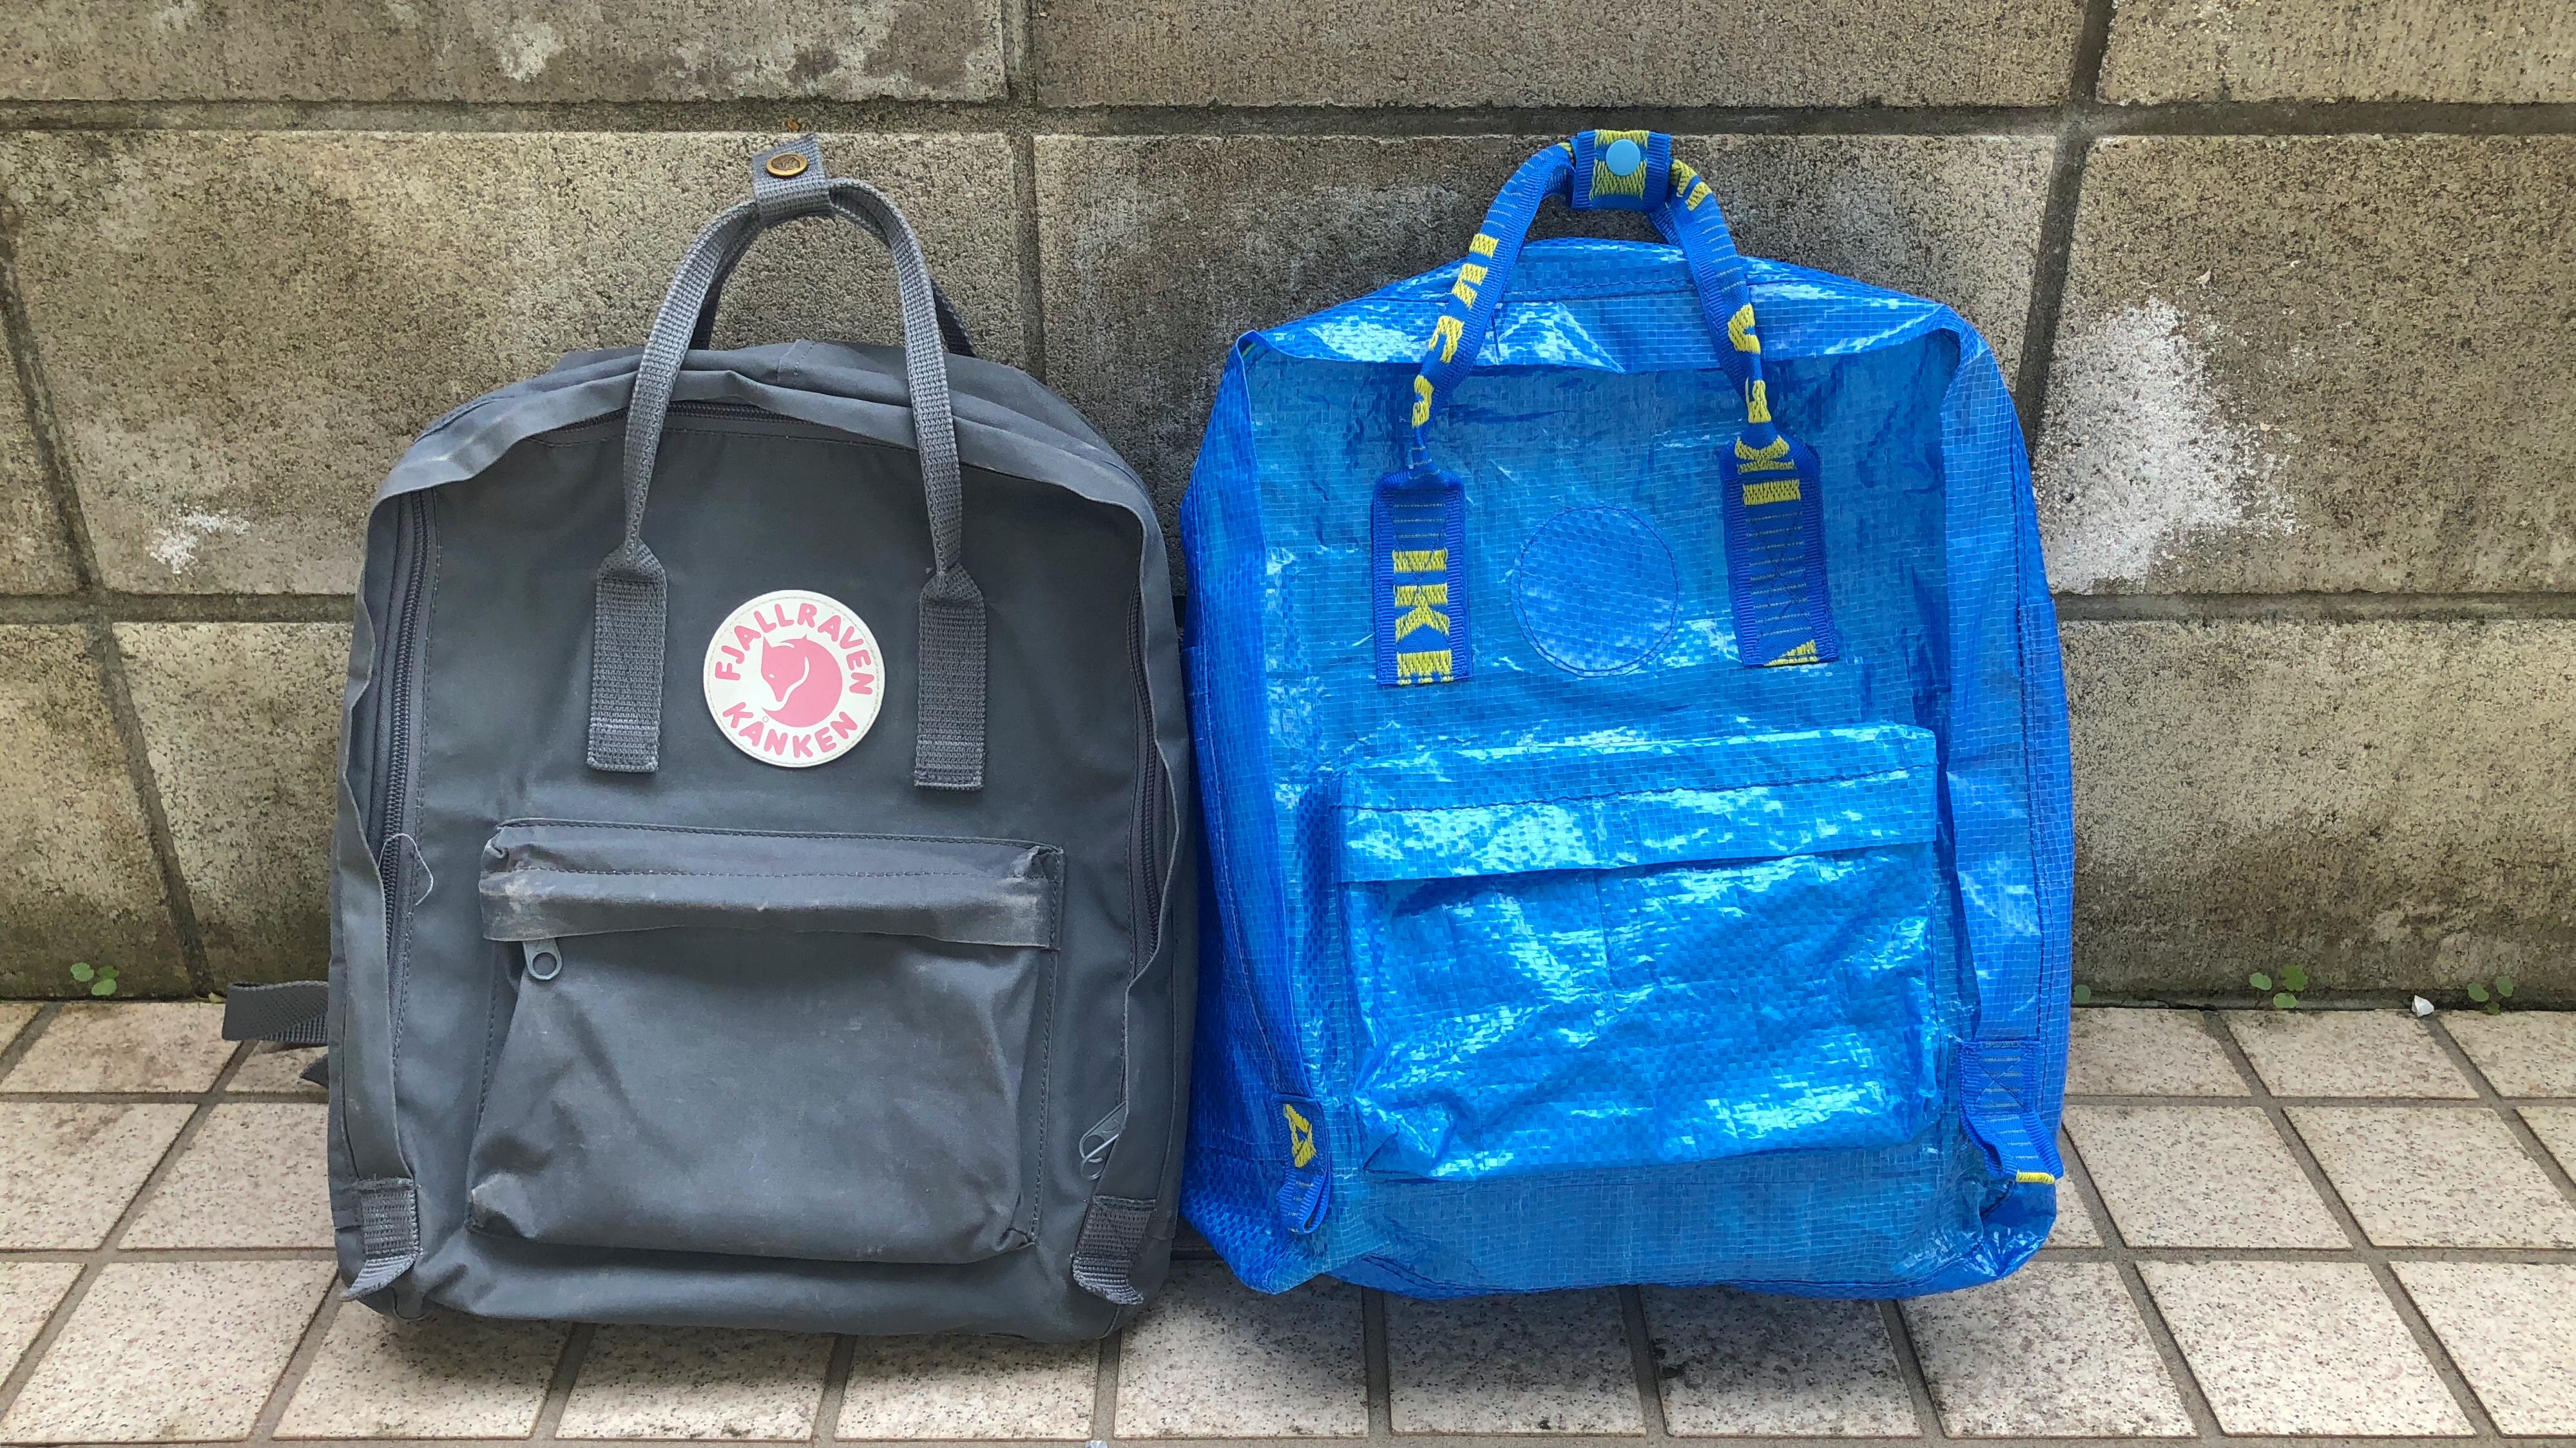 755c18b0cb IKEA backpack (Kanken backpack knockoff) – verypurpleperson